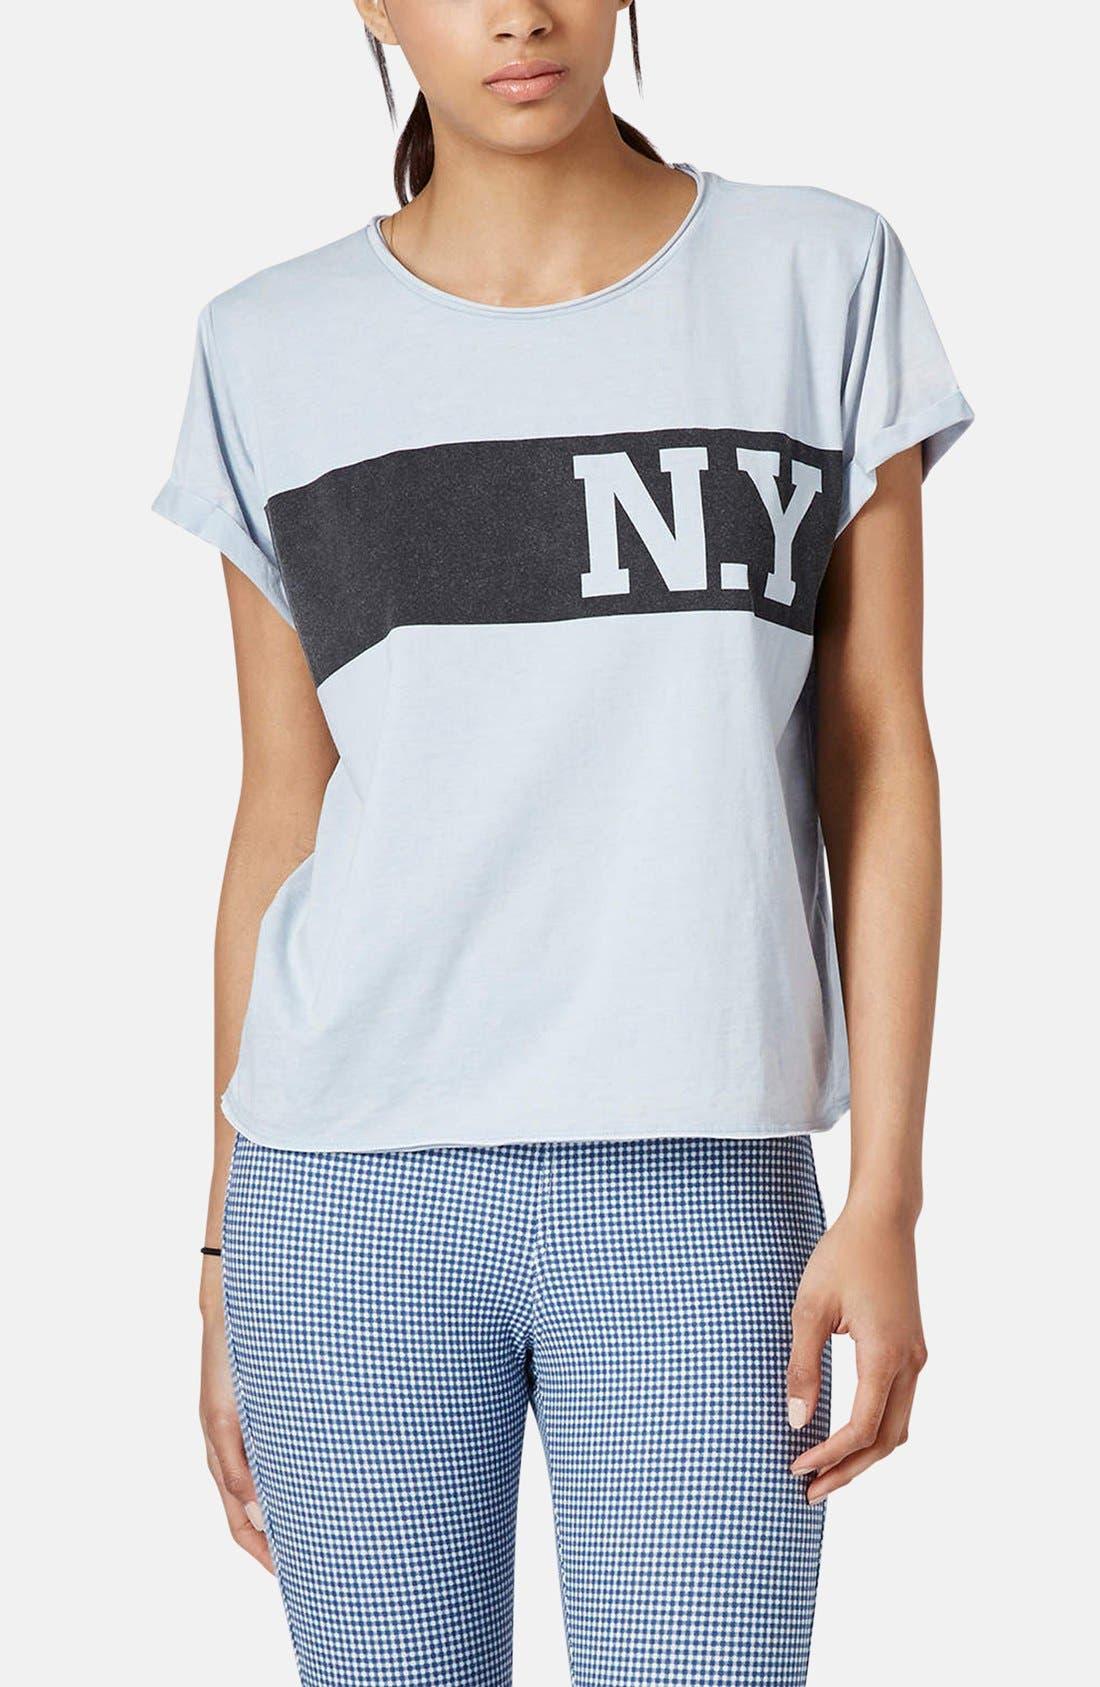 Main Image - Topshop 'New York' Graphic Tee (Petite)